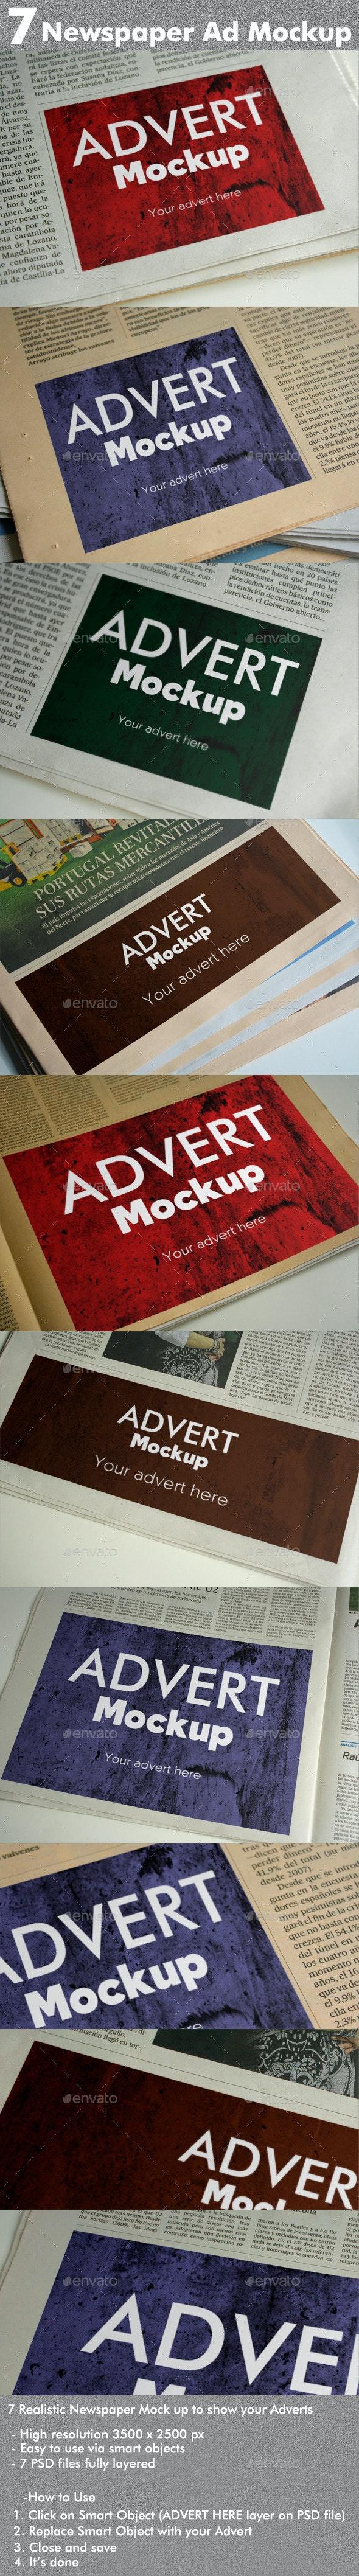 7 Newspaper Ad Mockups - Product Mock-Ups Graphics